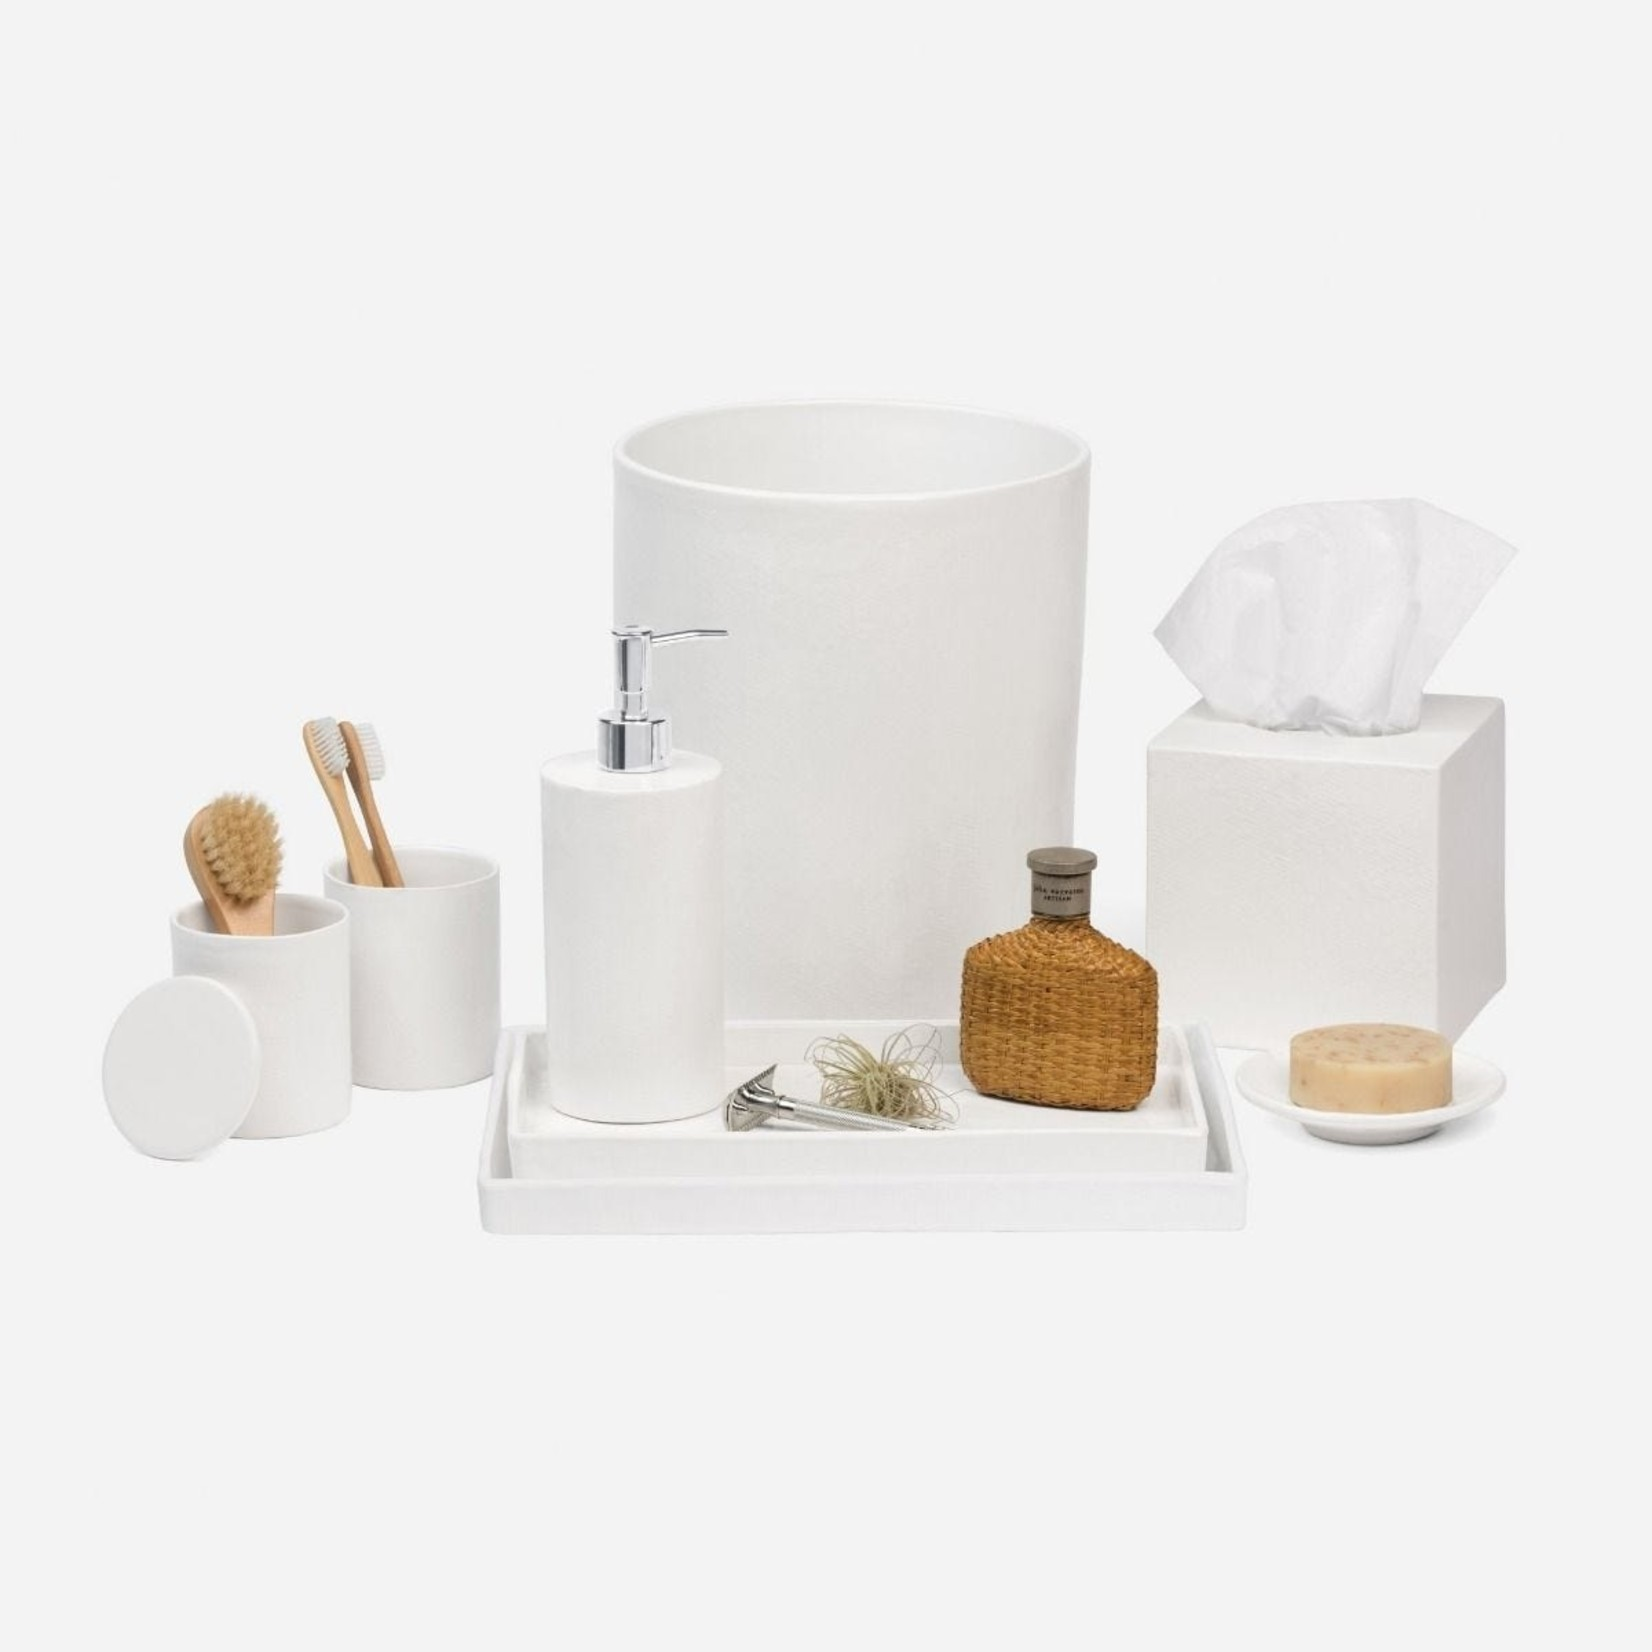 Pigeon and Poodle Cordoba White Ceramic Bathroom Set